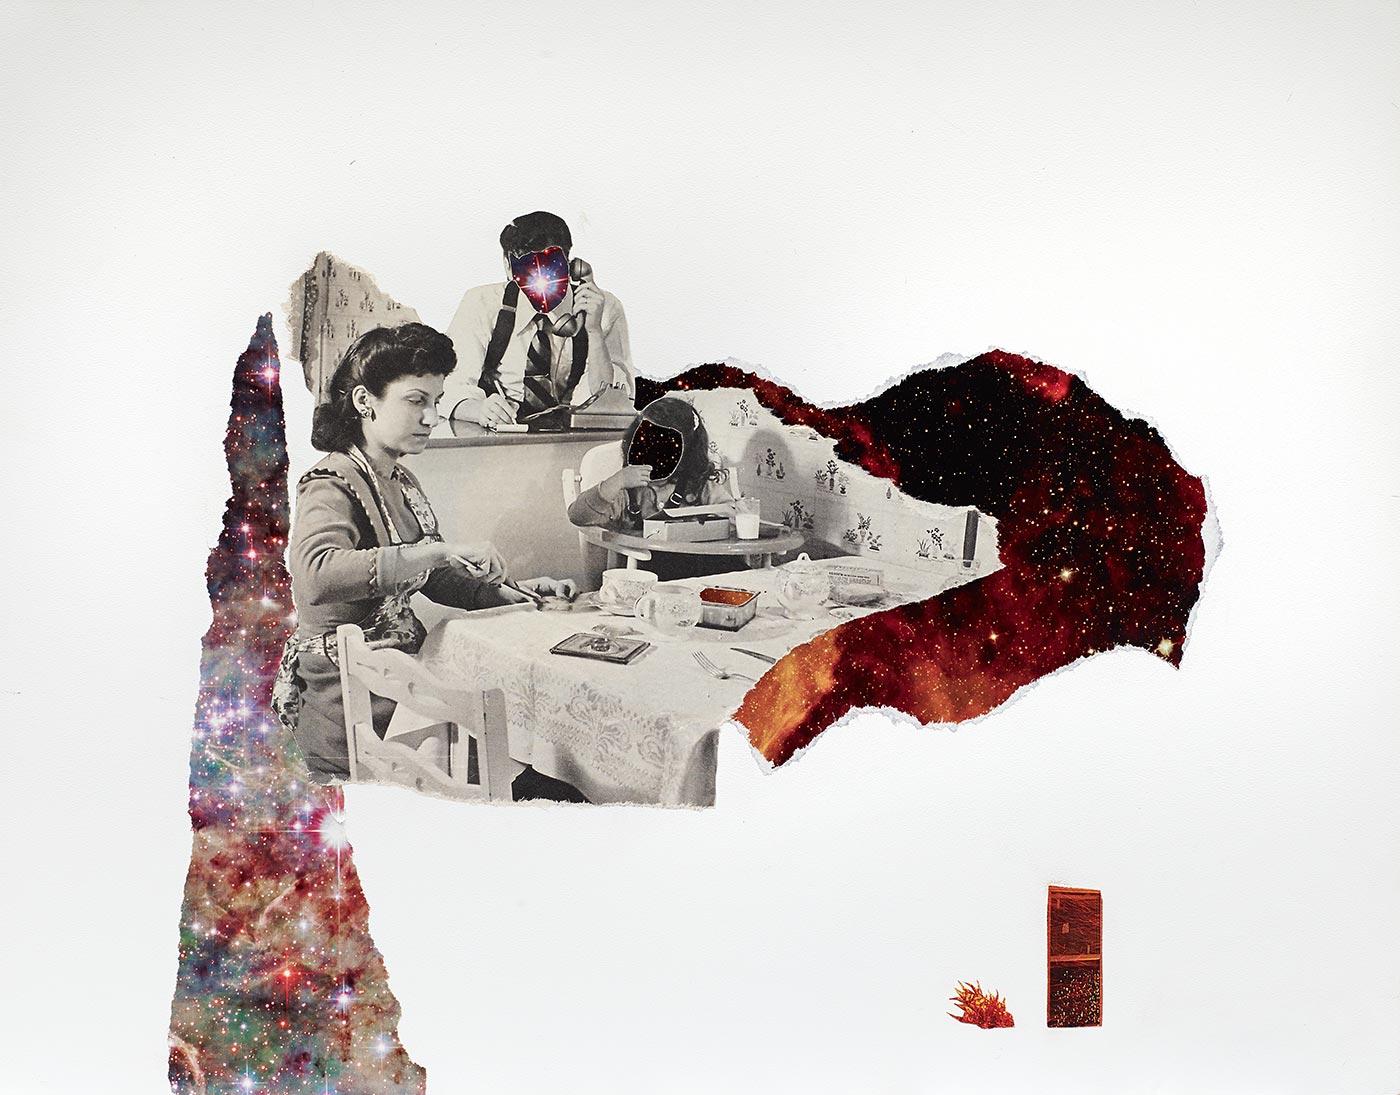 Nicole J. Moss  - Dinner Time